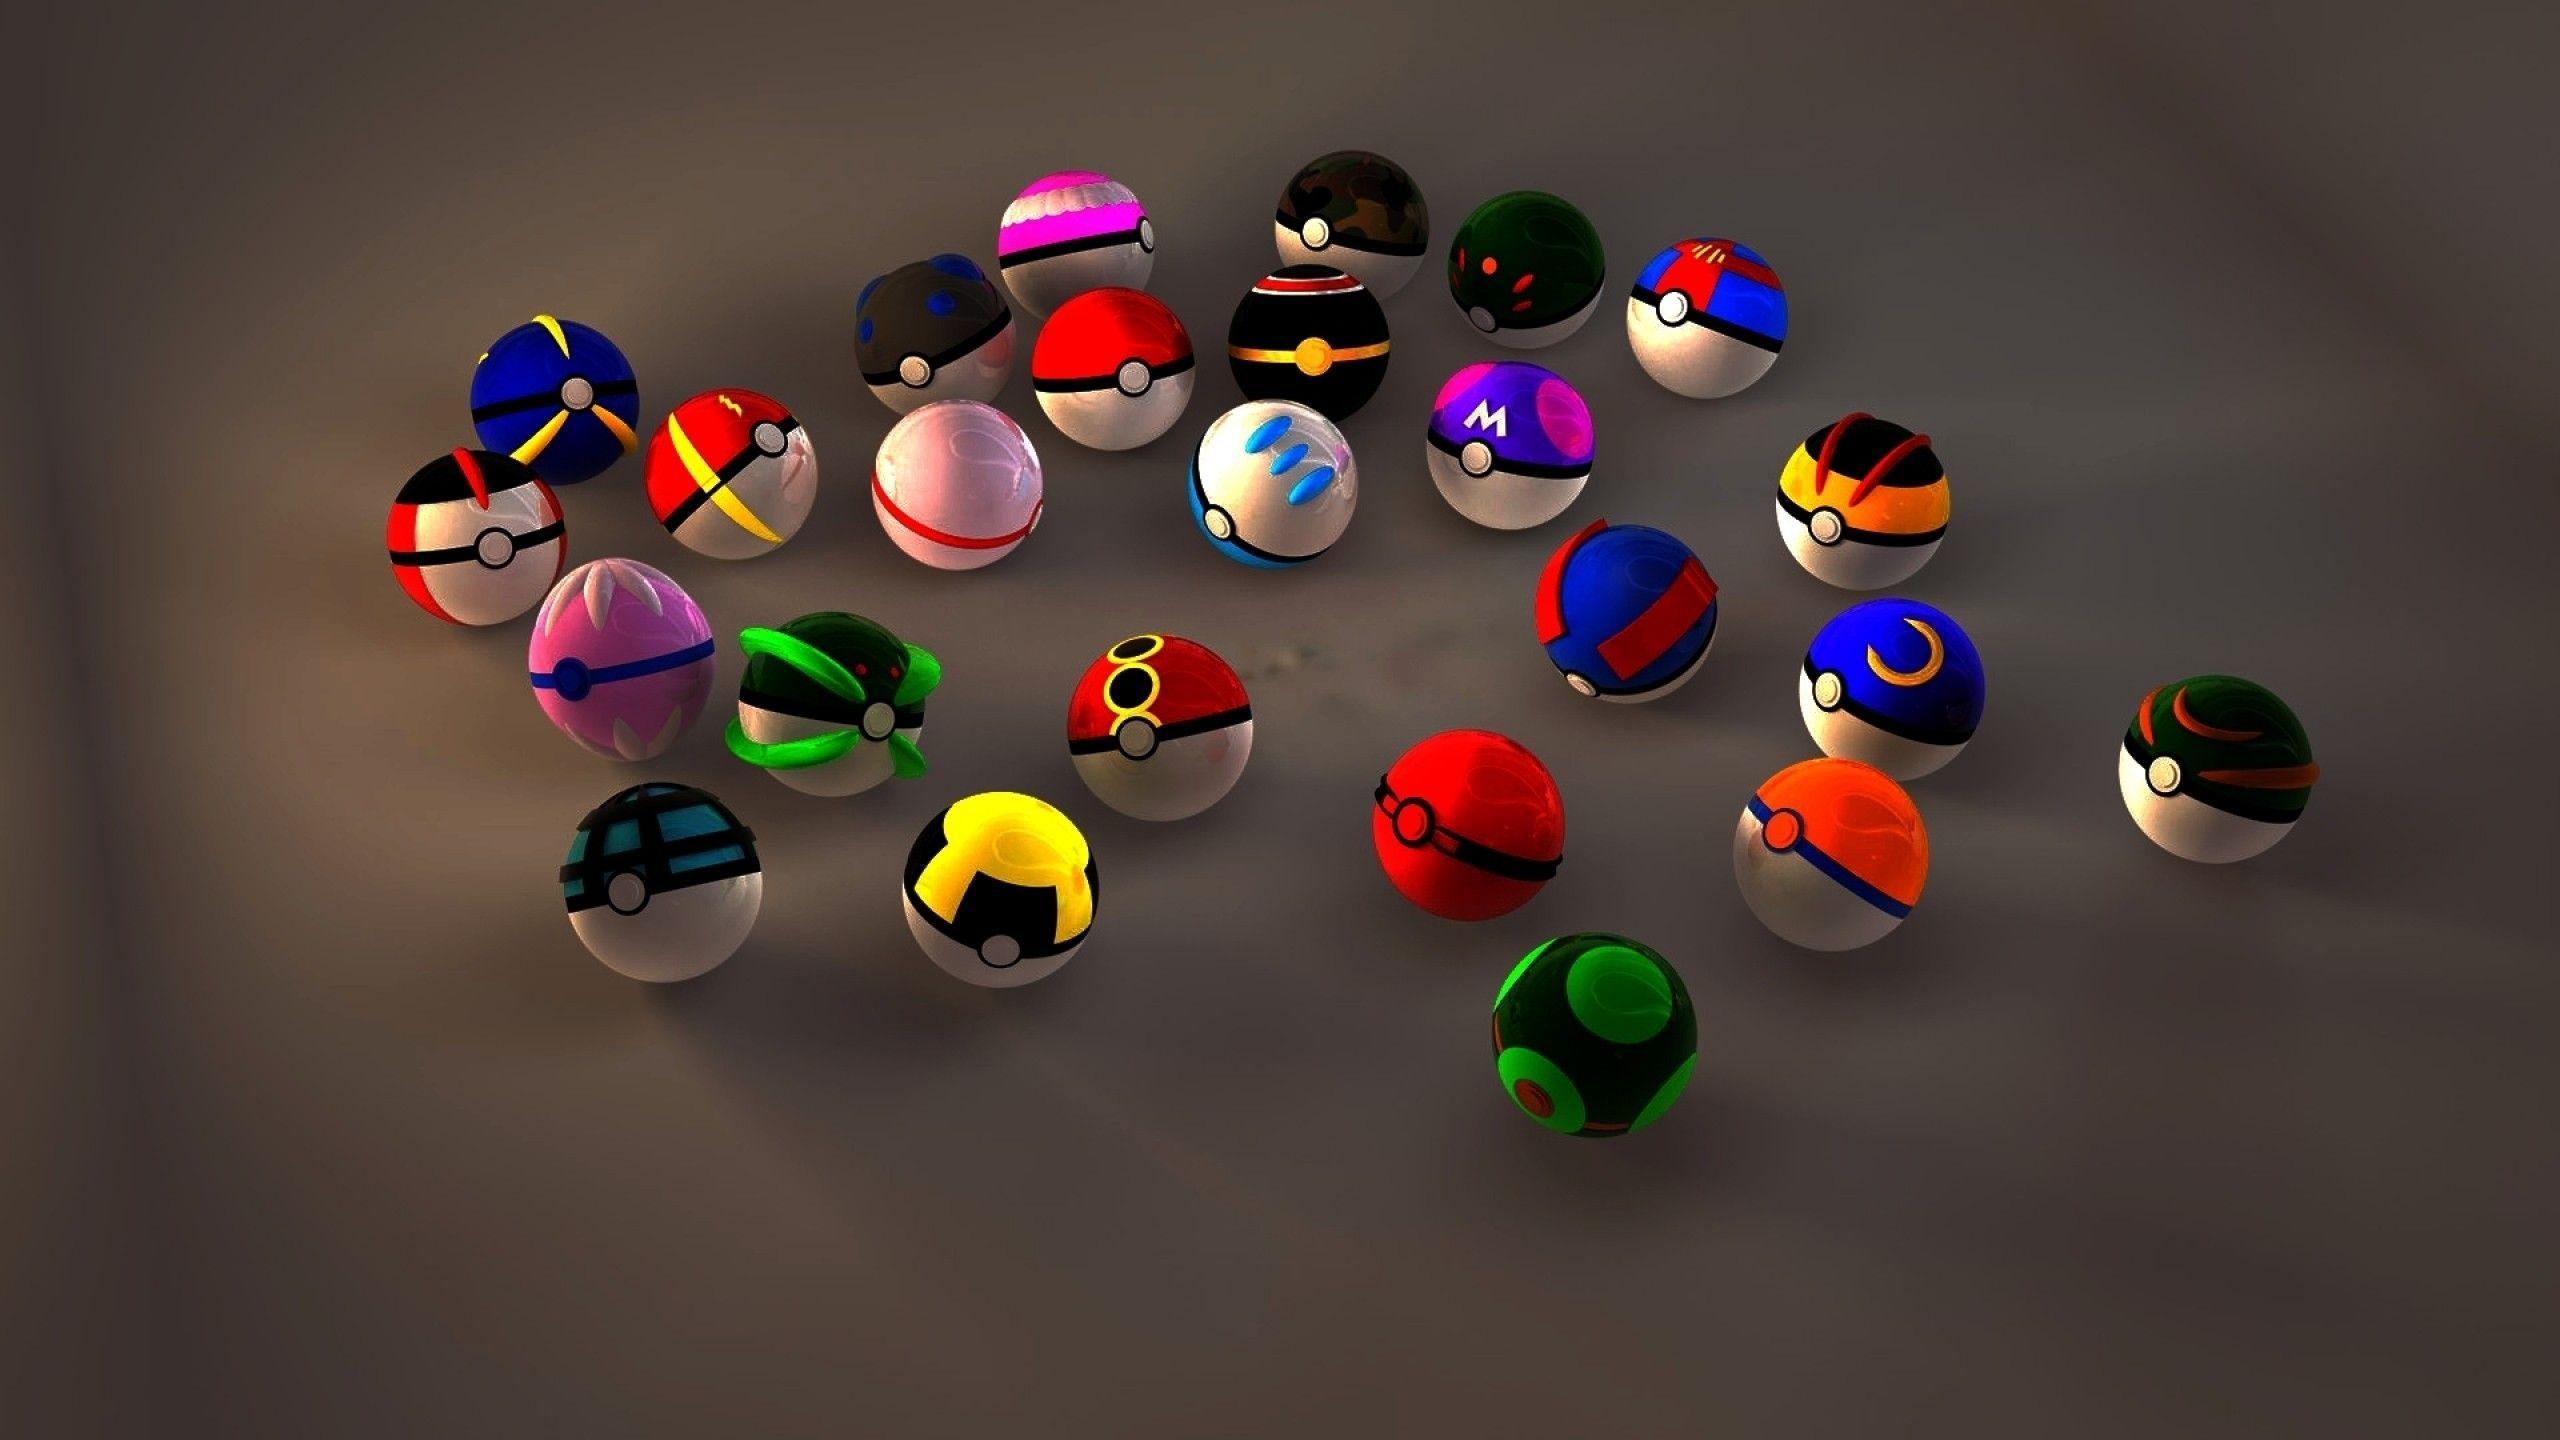 Pokmon Balls Wallpapers 2560x1440